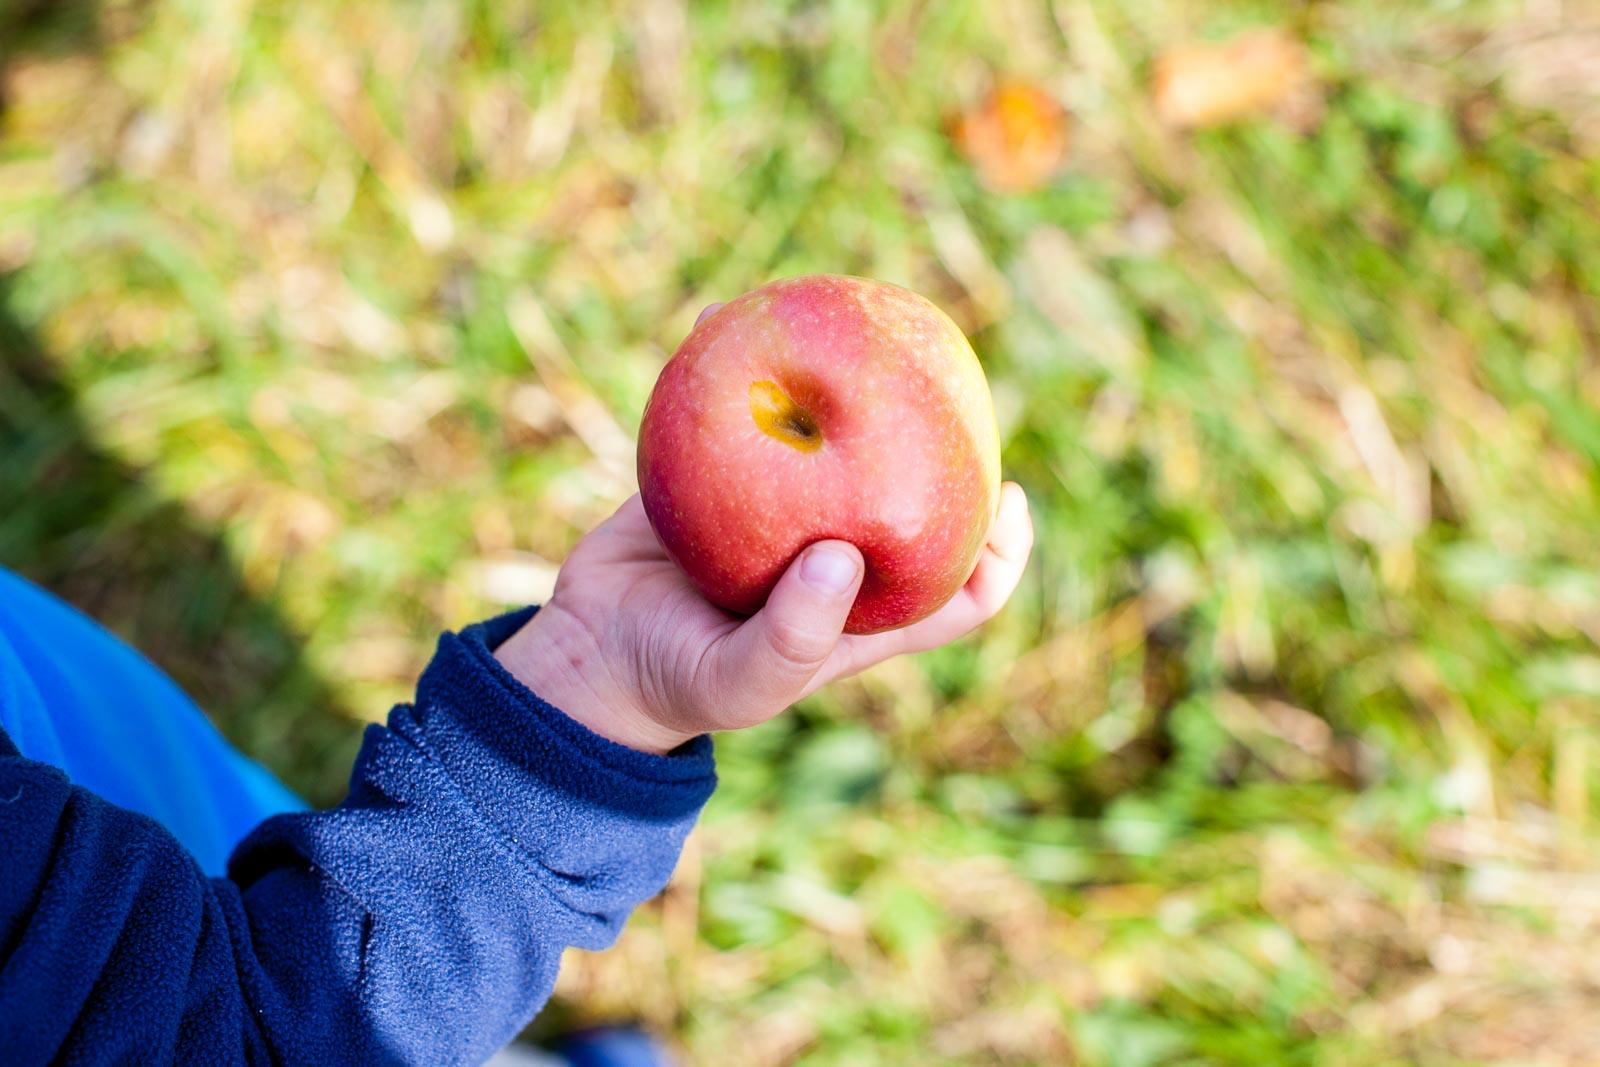 fishkill-farm-applepiking-2016-robertiaga-5